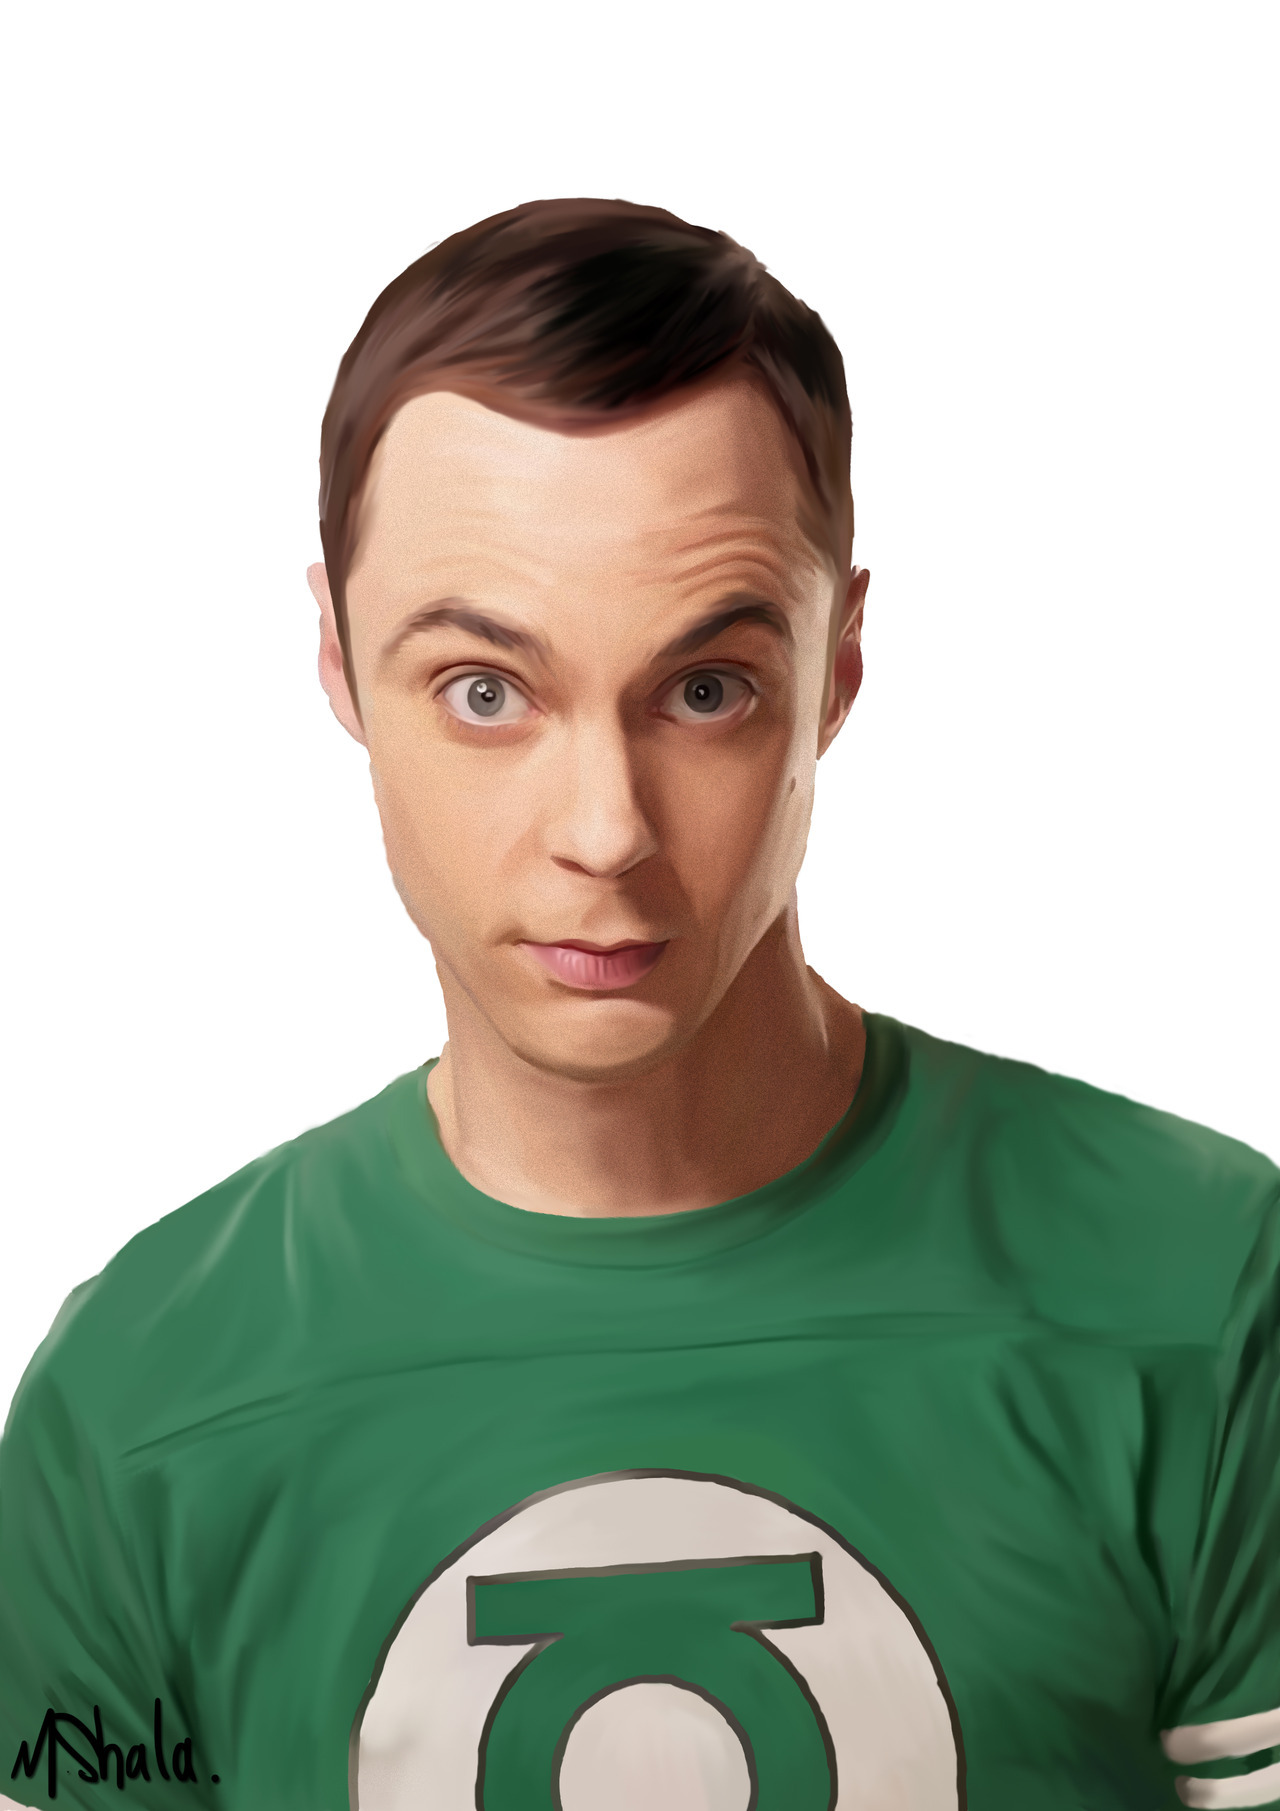 Mlg Hd Wallpaper Jim Parsons As Sheldon Lee Cooper Big Bang Theory